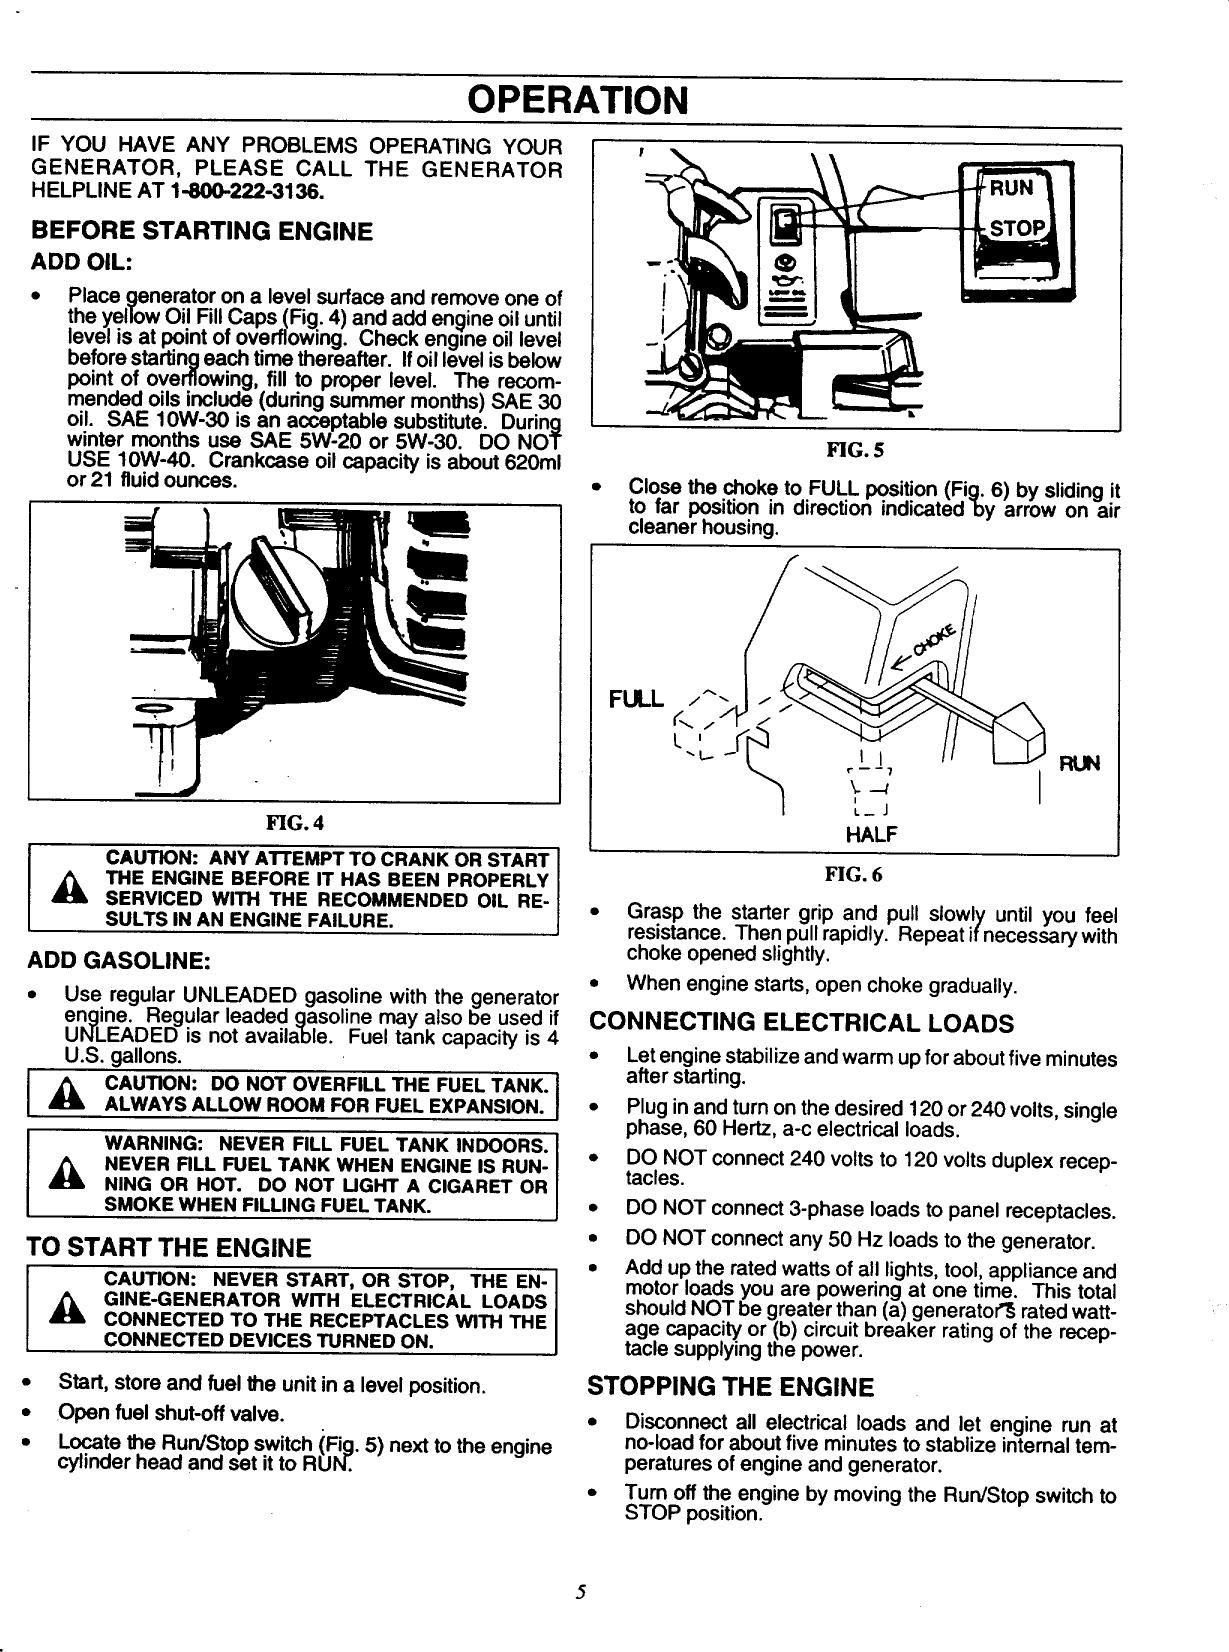 Craftsman 580326720 User Manual DELUXE PORTABLE GENERATOR